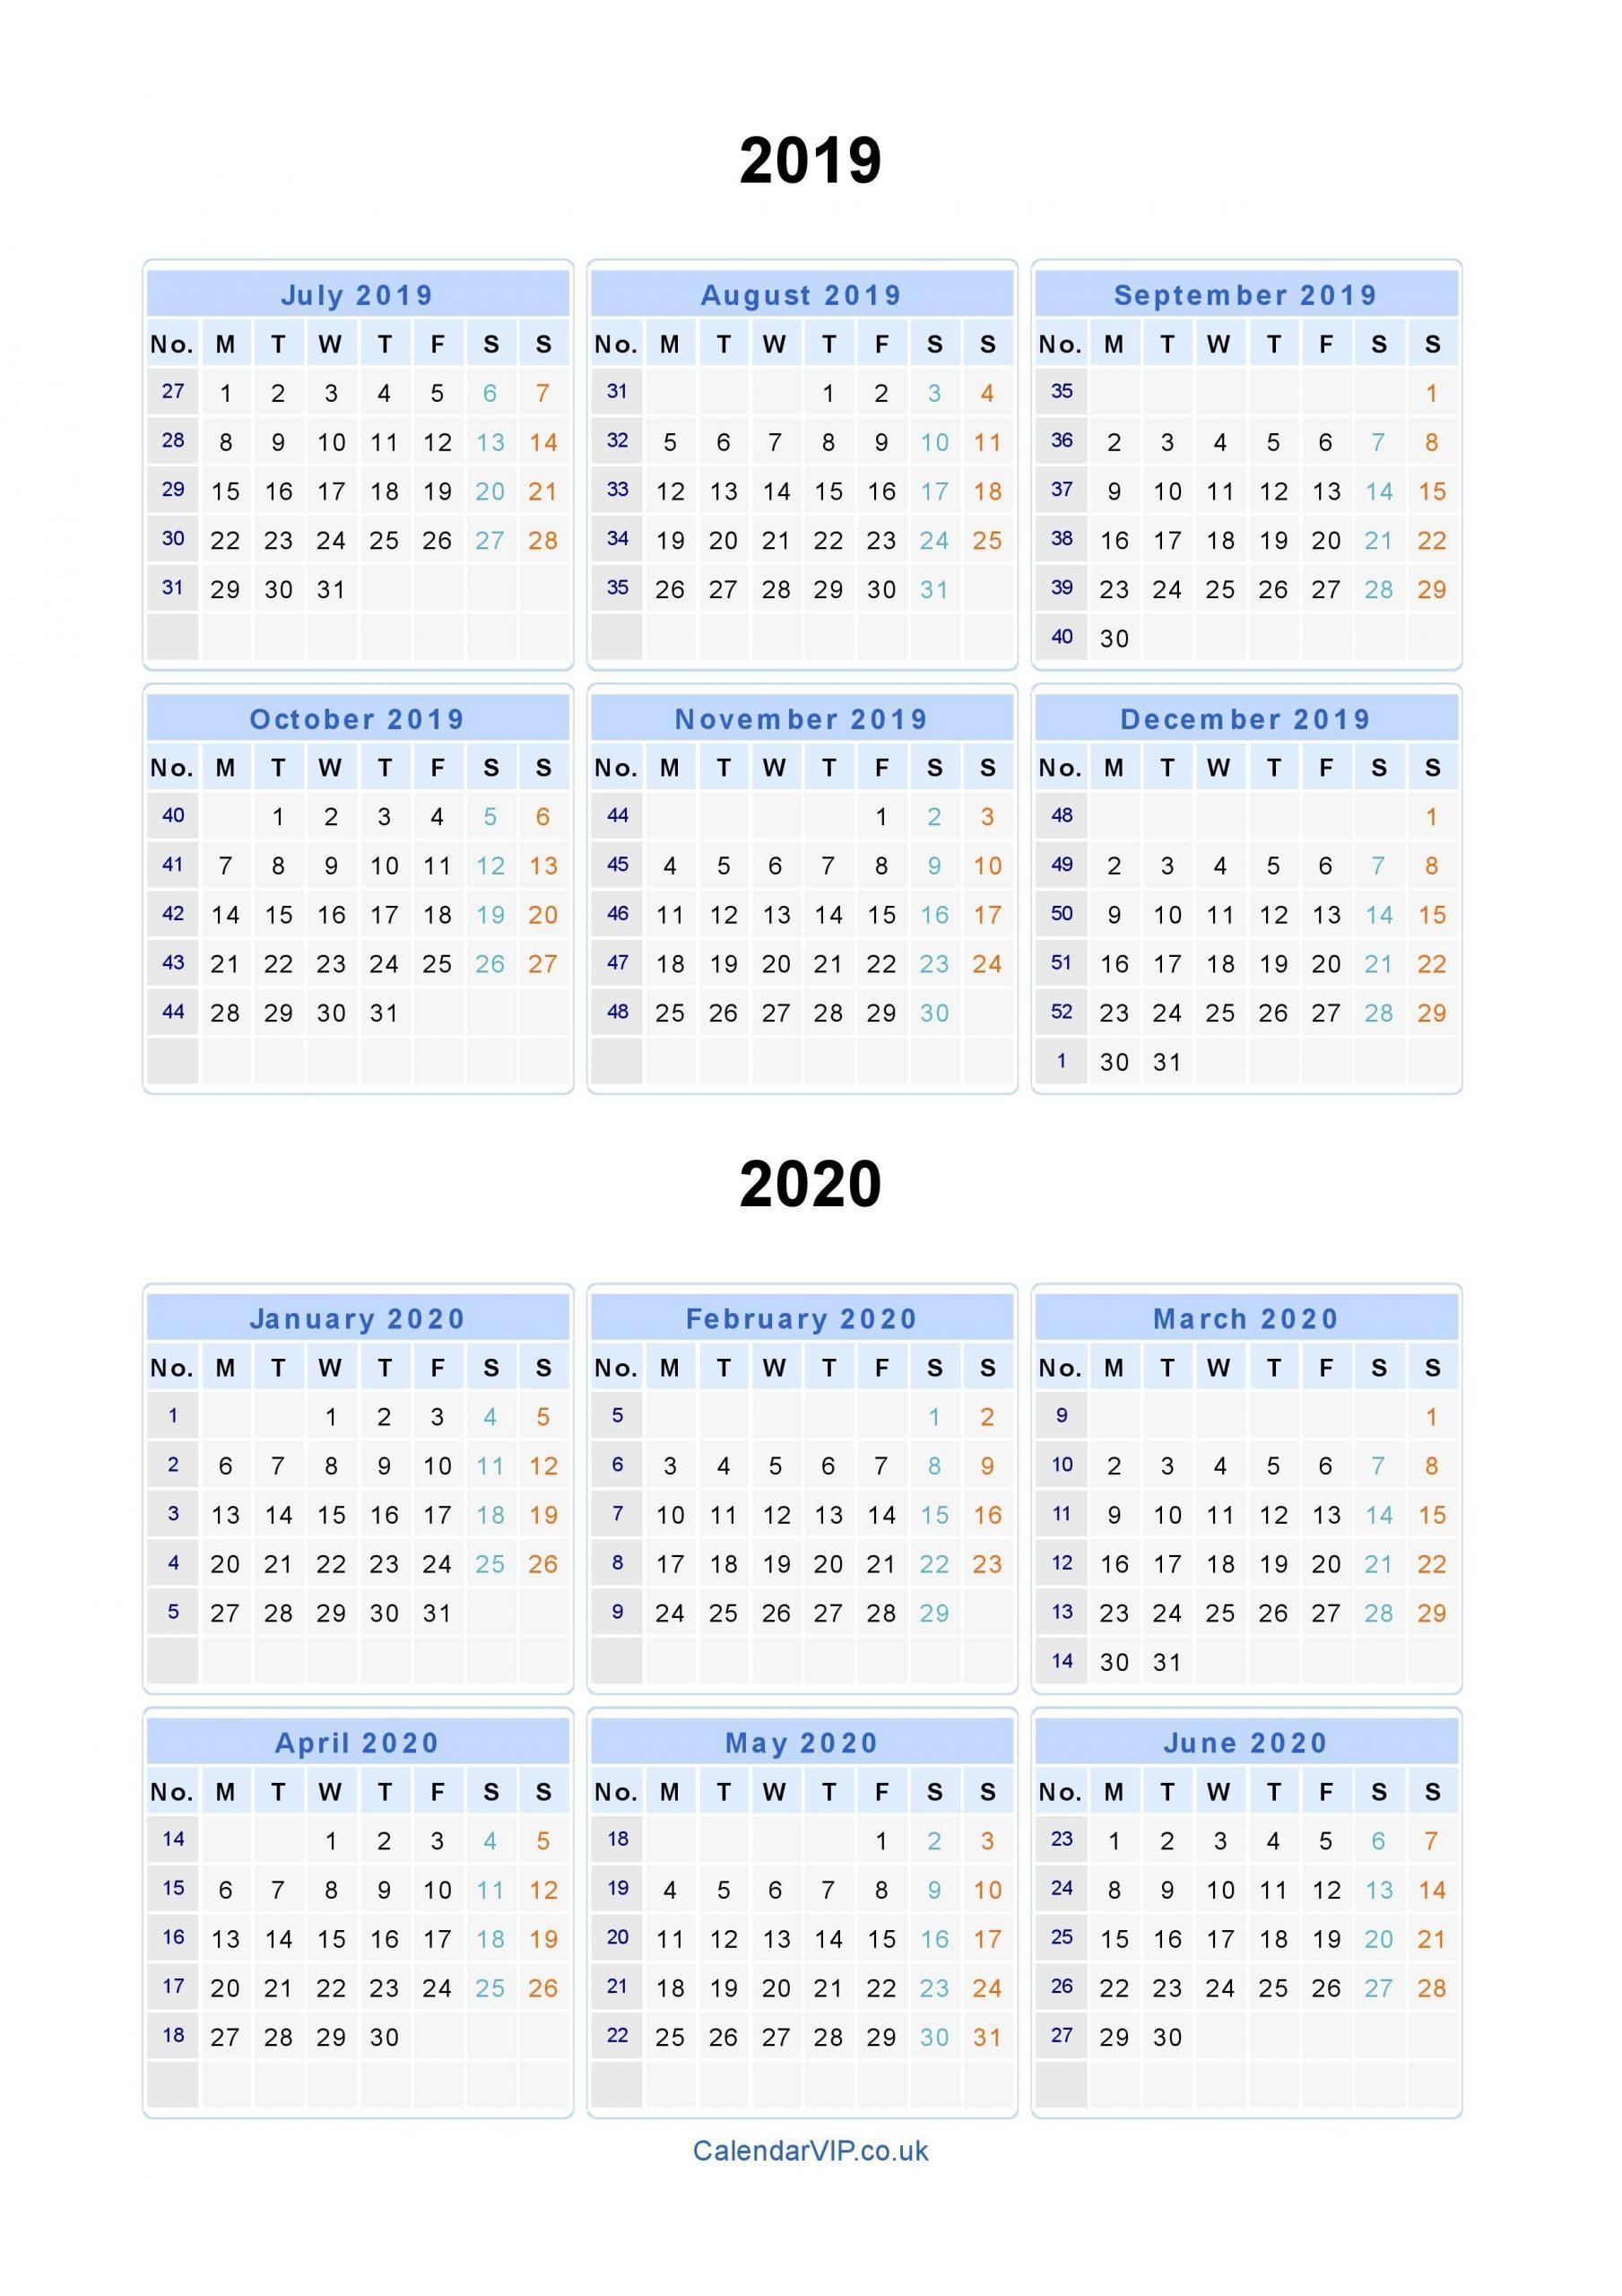 Split Year Calendars 2019 2020 - Calendar From July 2019 To